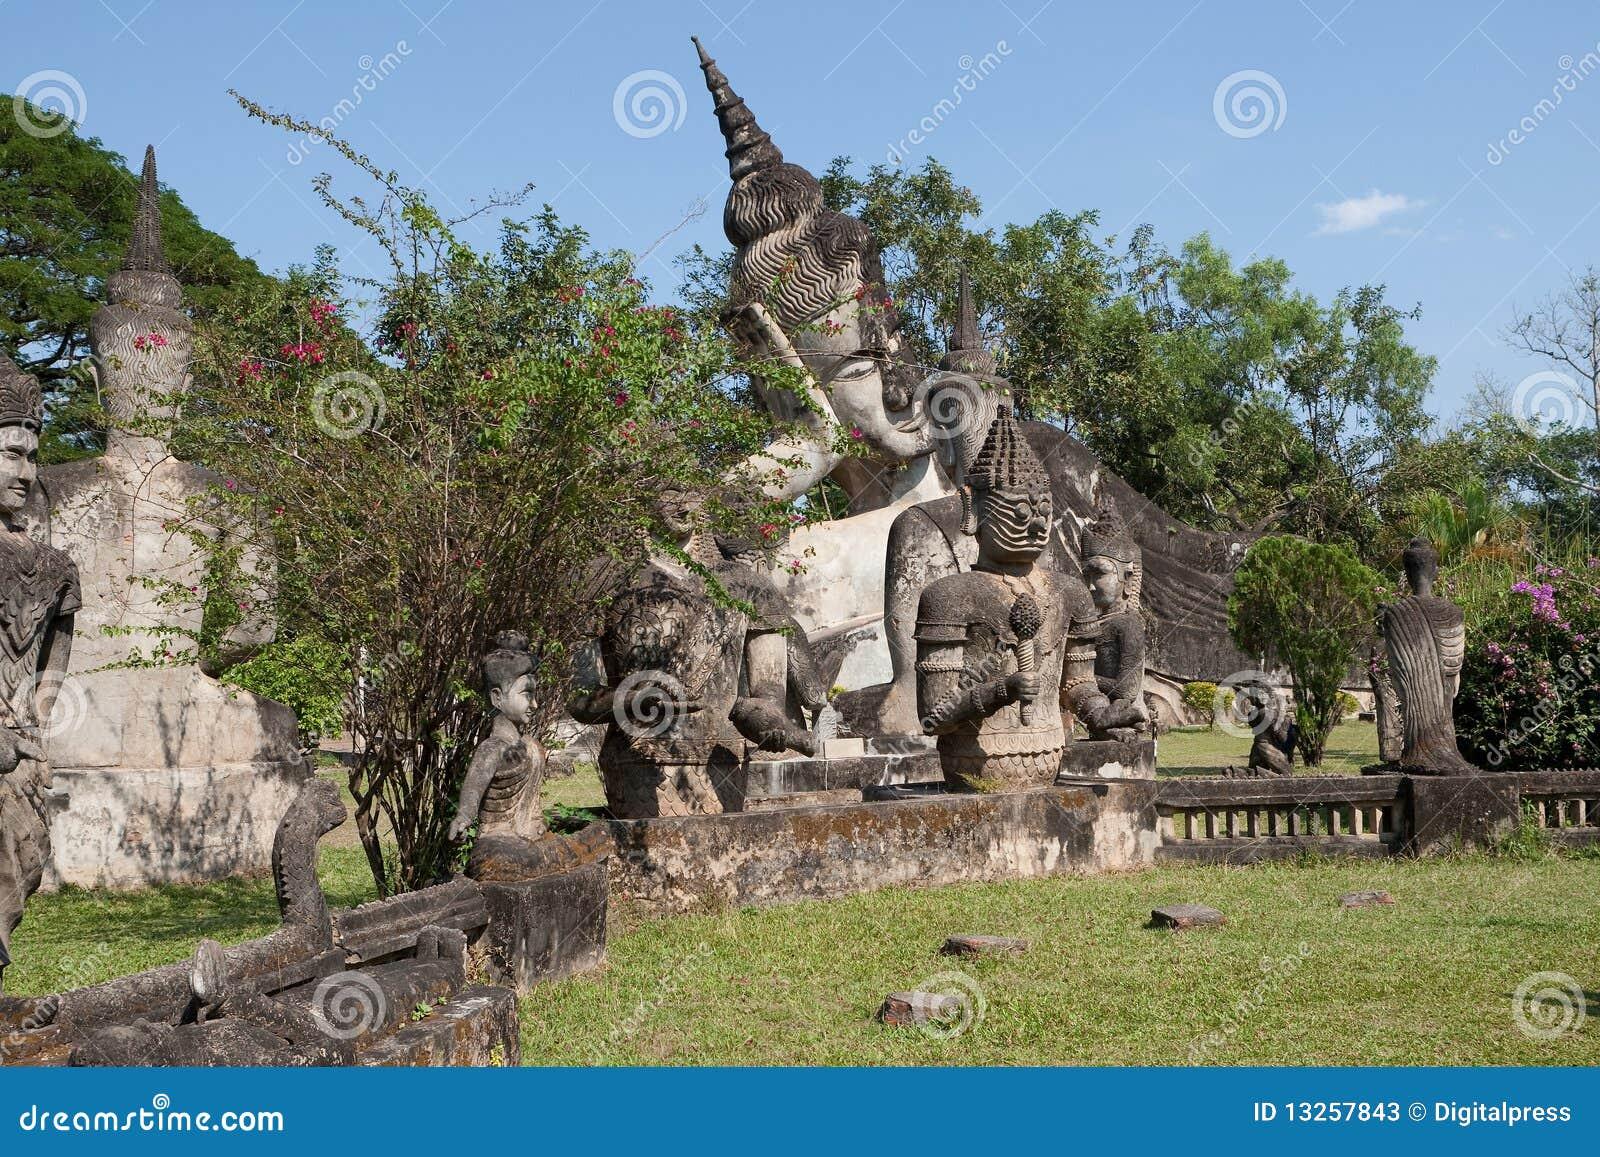 stone park buddhist personals White sands buddhist center, mims, fl 36k likes white sands buddhist center (wsbc) tu vien cat trang, 4640 knost dr, mims, florida 32754 usa phone.